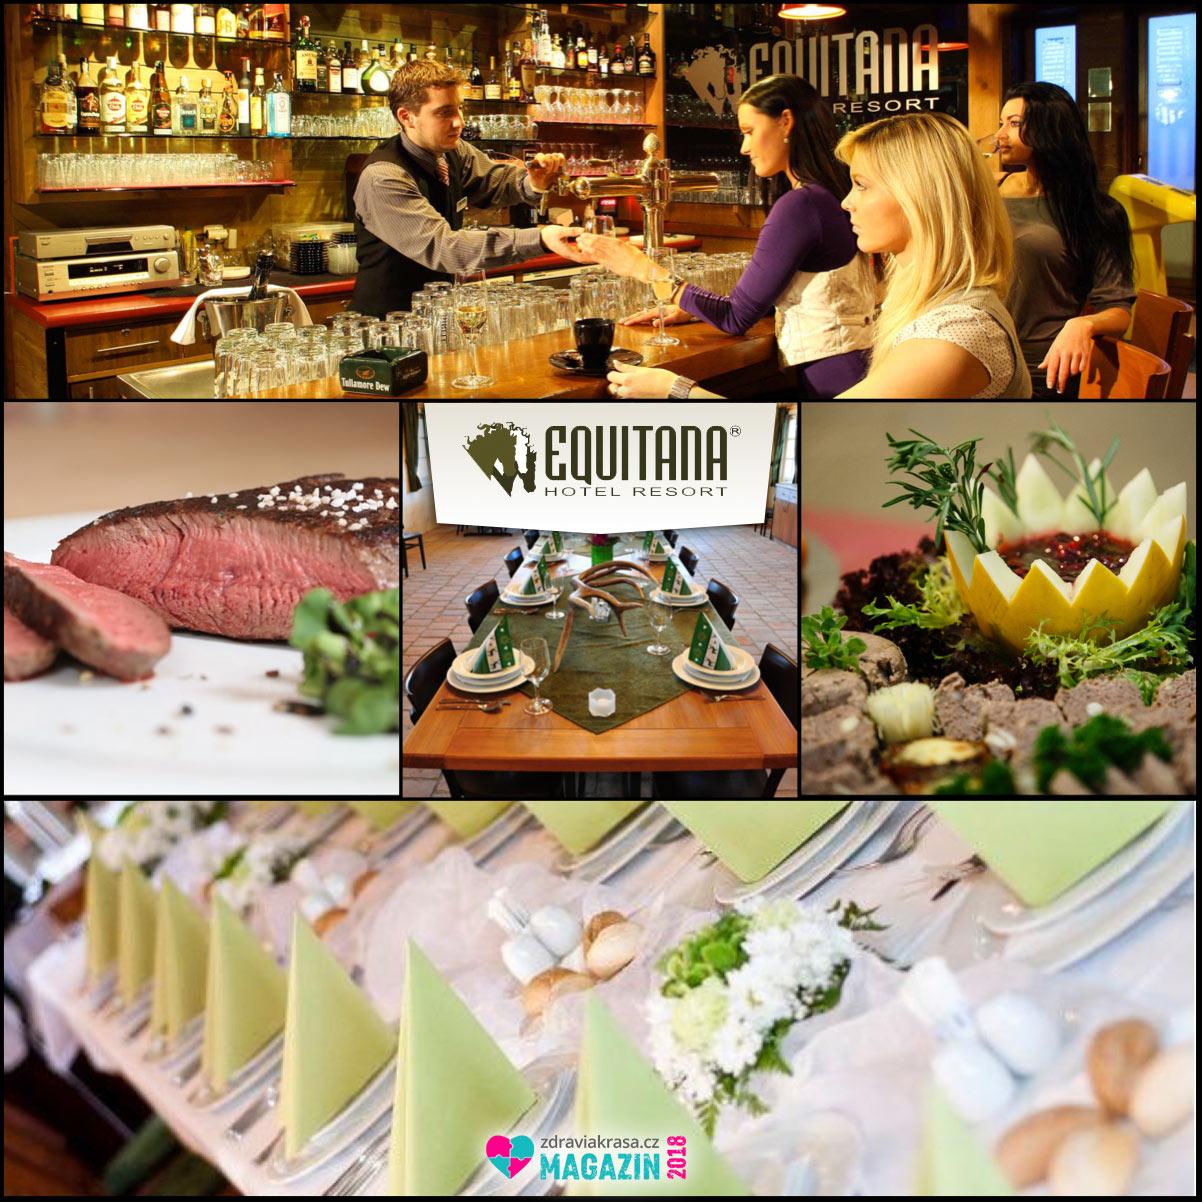 Equitana Hotel Resort – to je i kvalitní gastronomie.